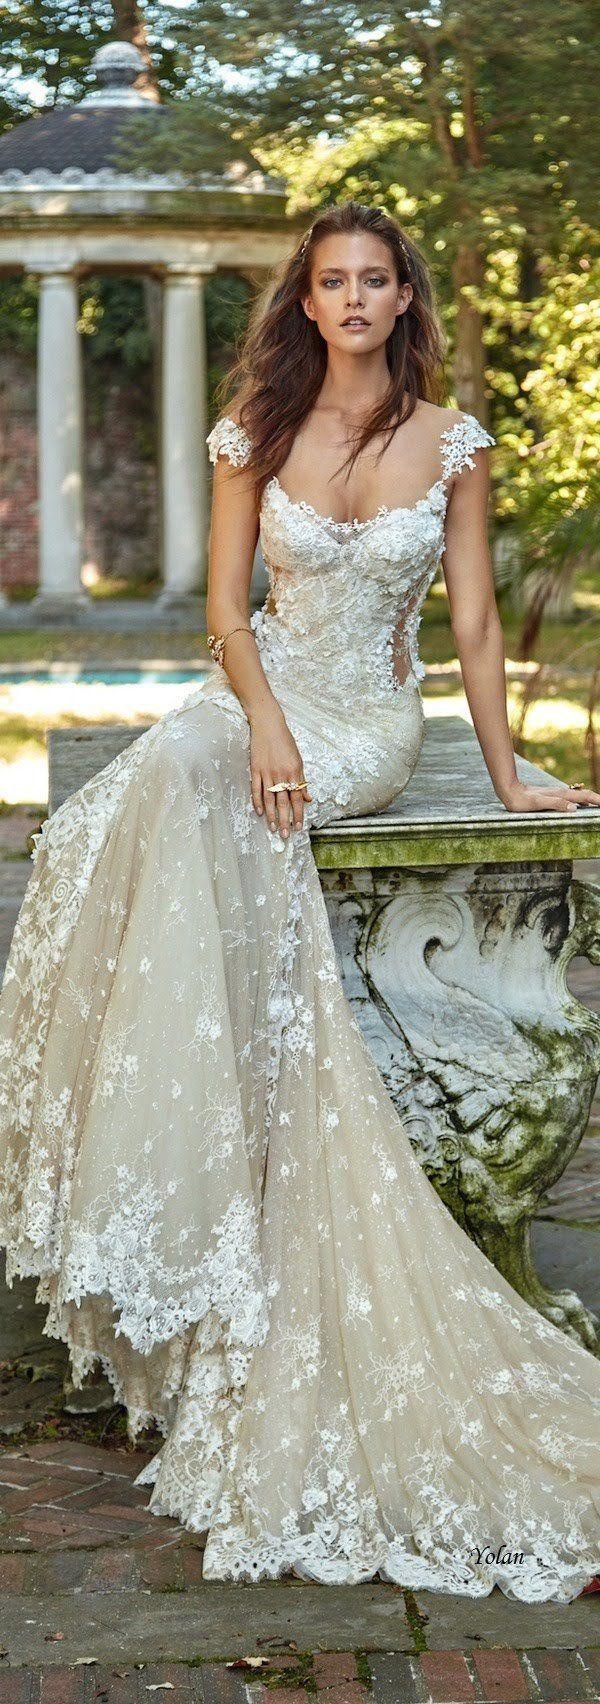 16 best Elope! images on Pinterest | Short wedding gowns, Wedding ...